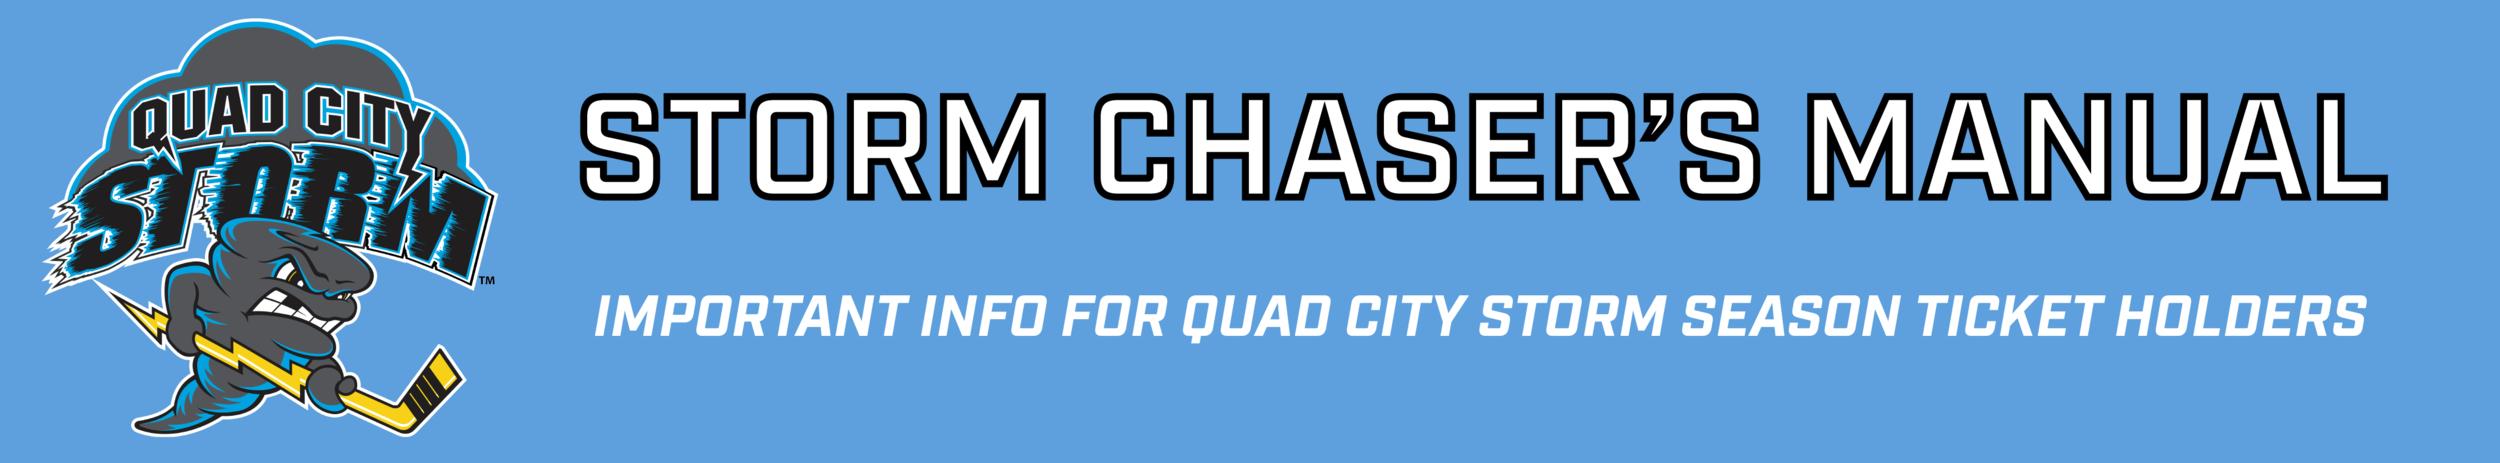 Storm Chaser Banner.png